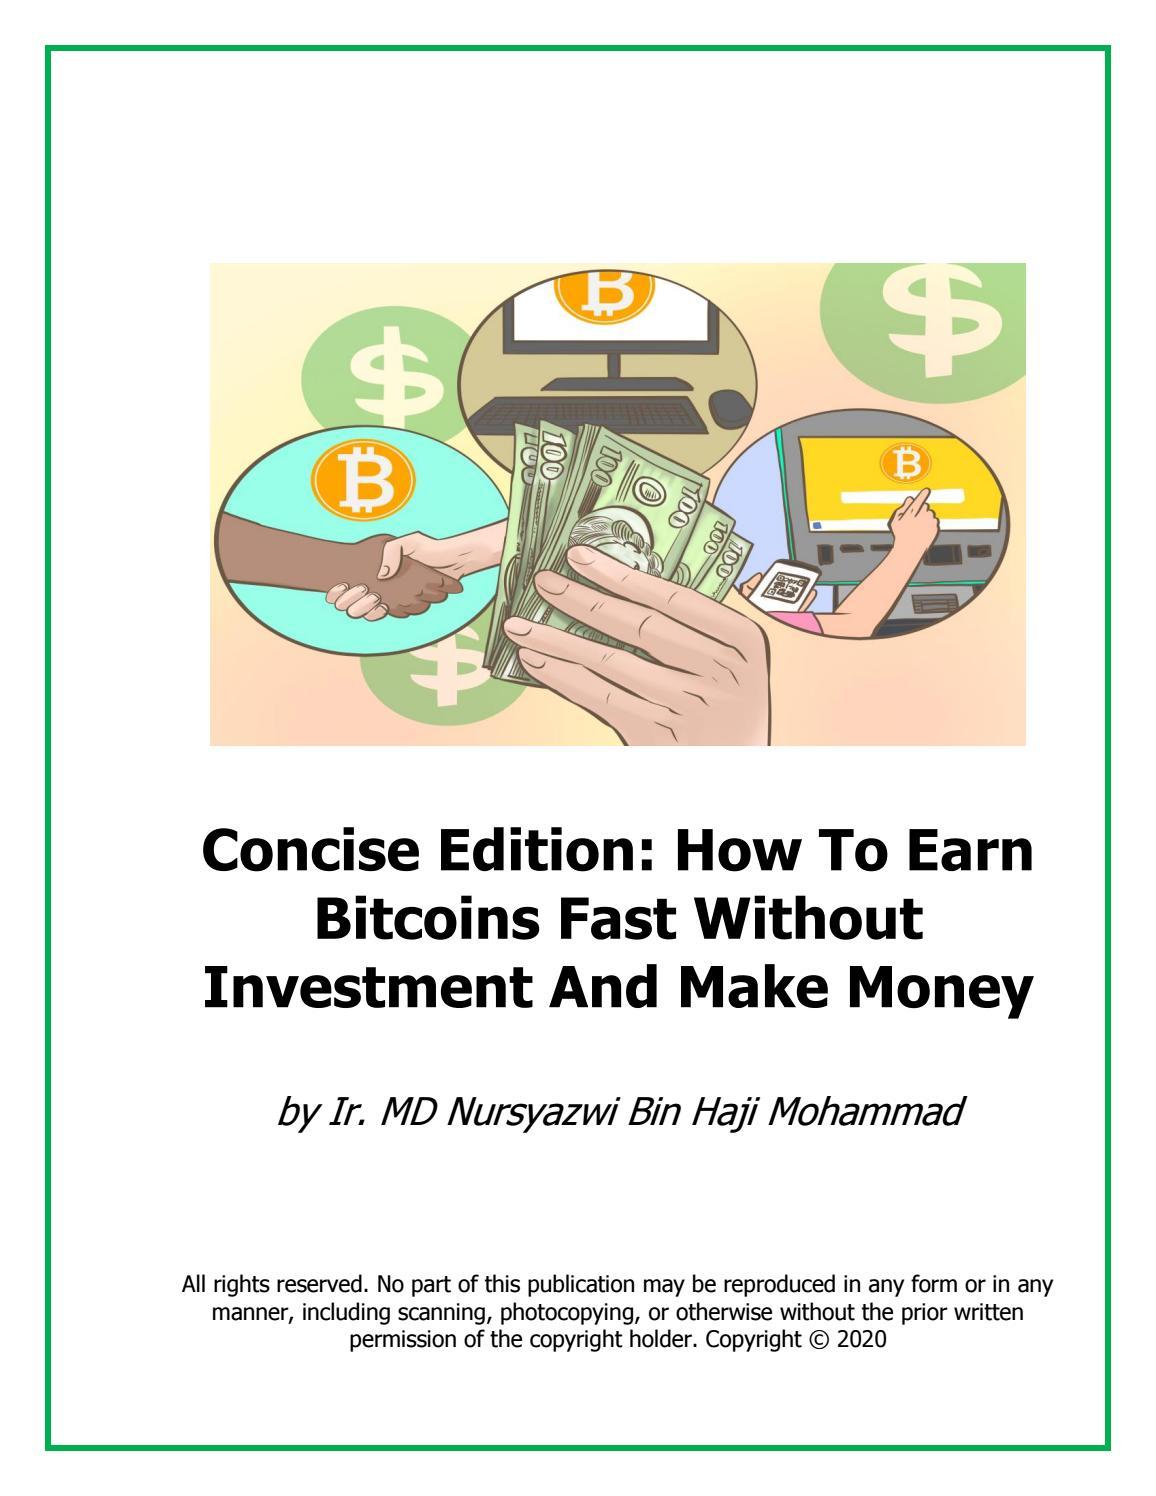 how to earn bitcoin very fast